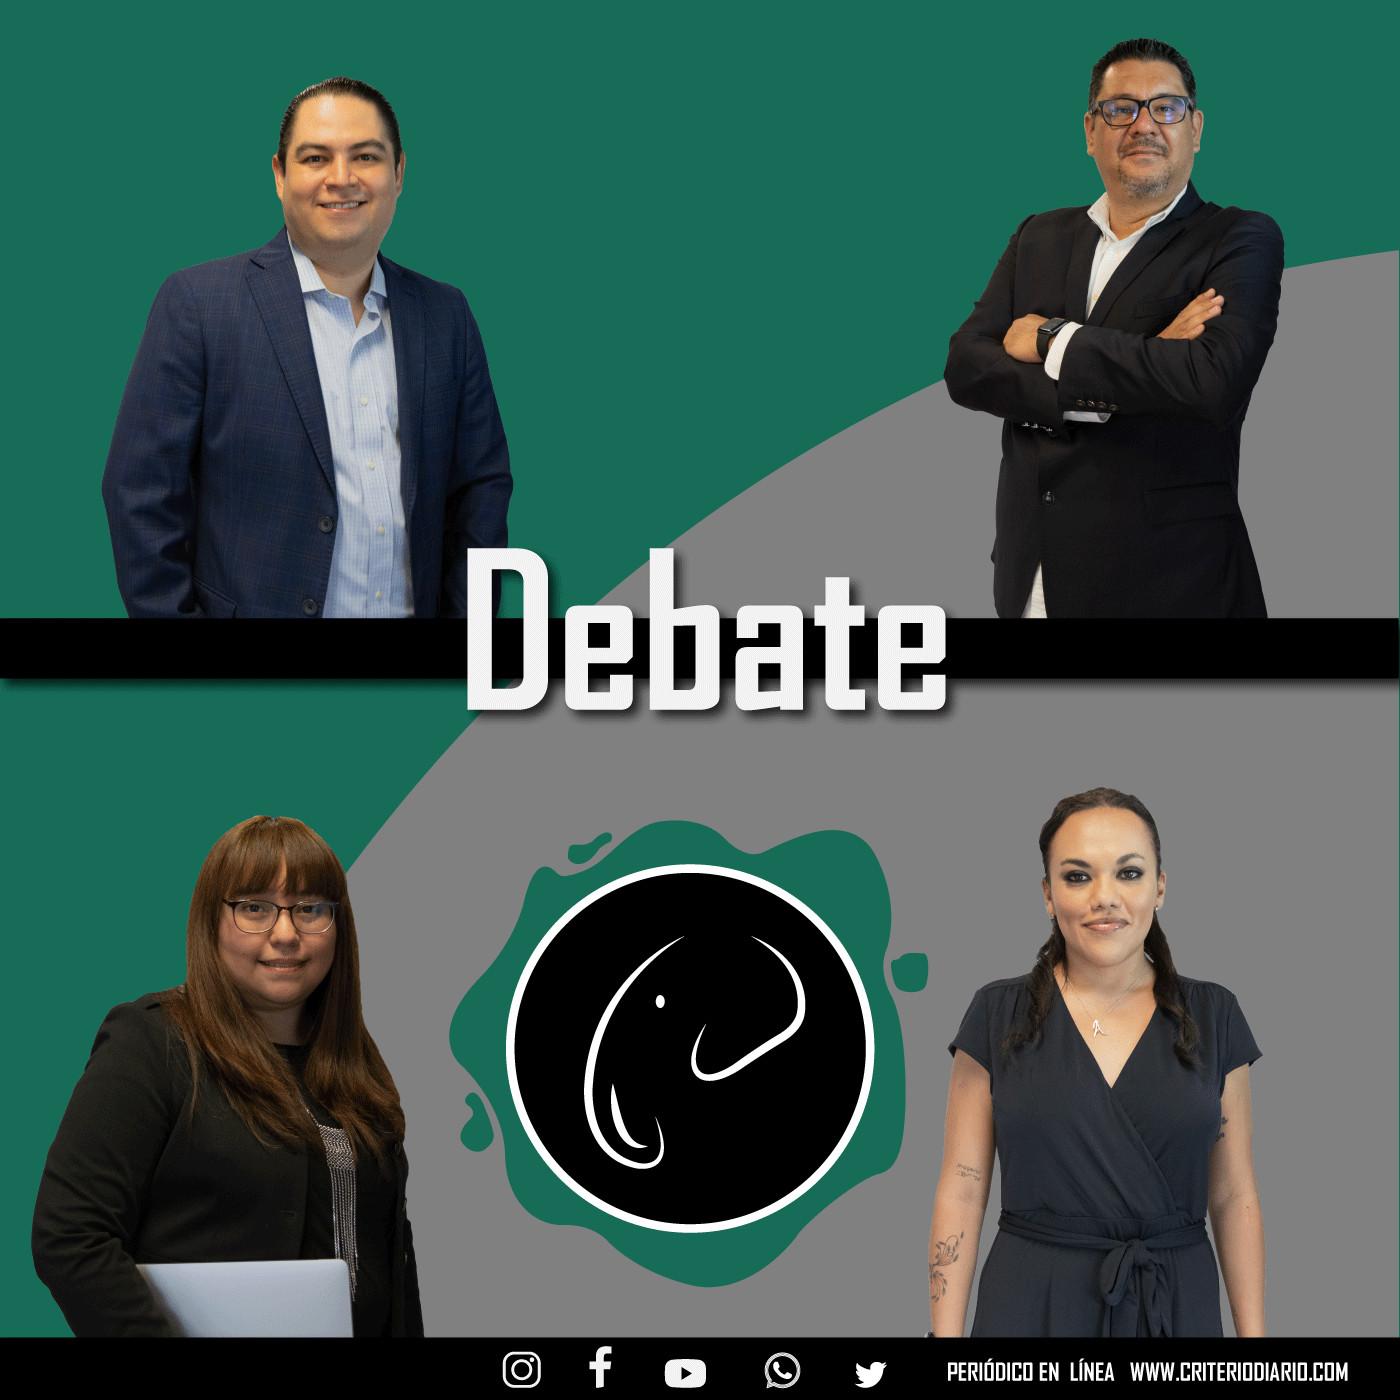 Episodio 7. Debate